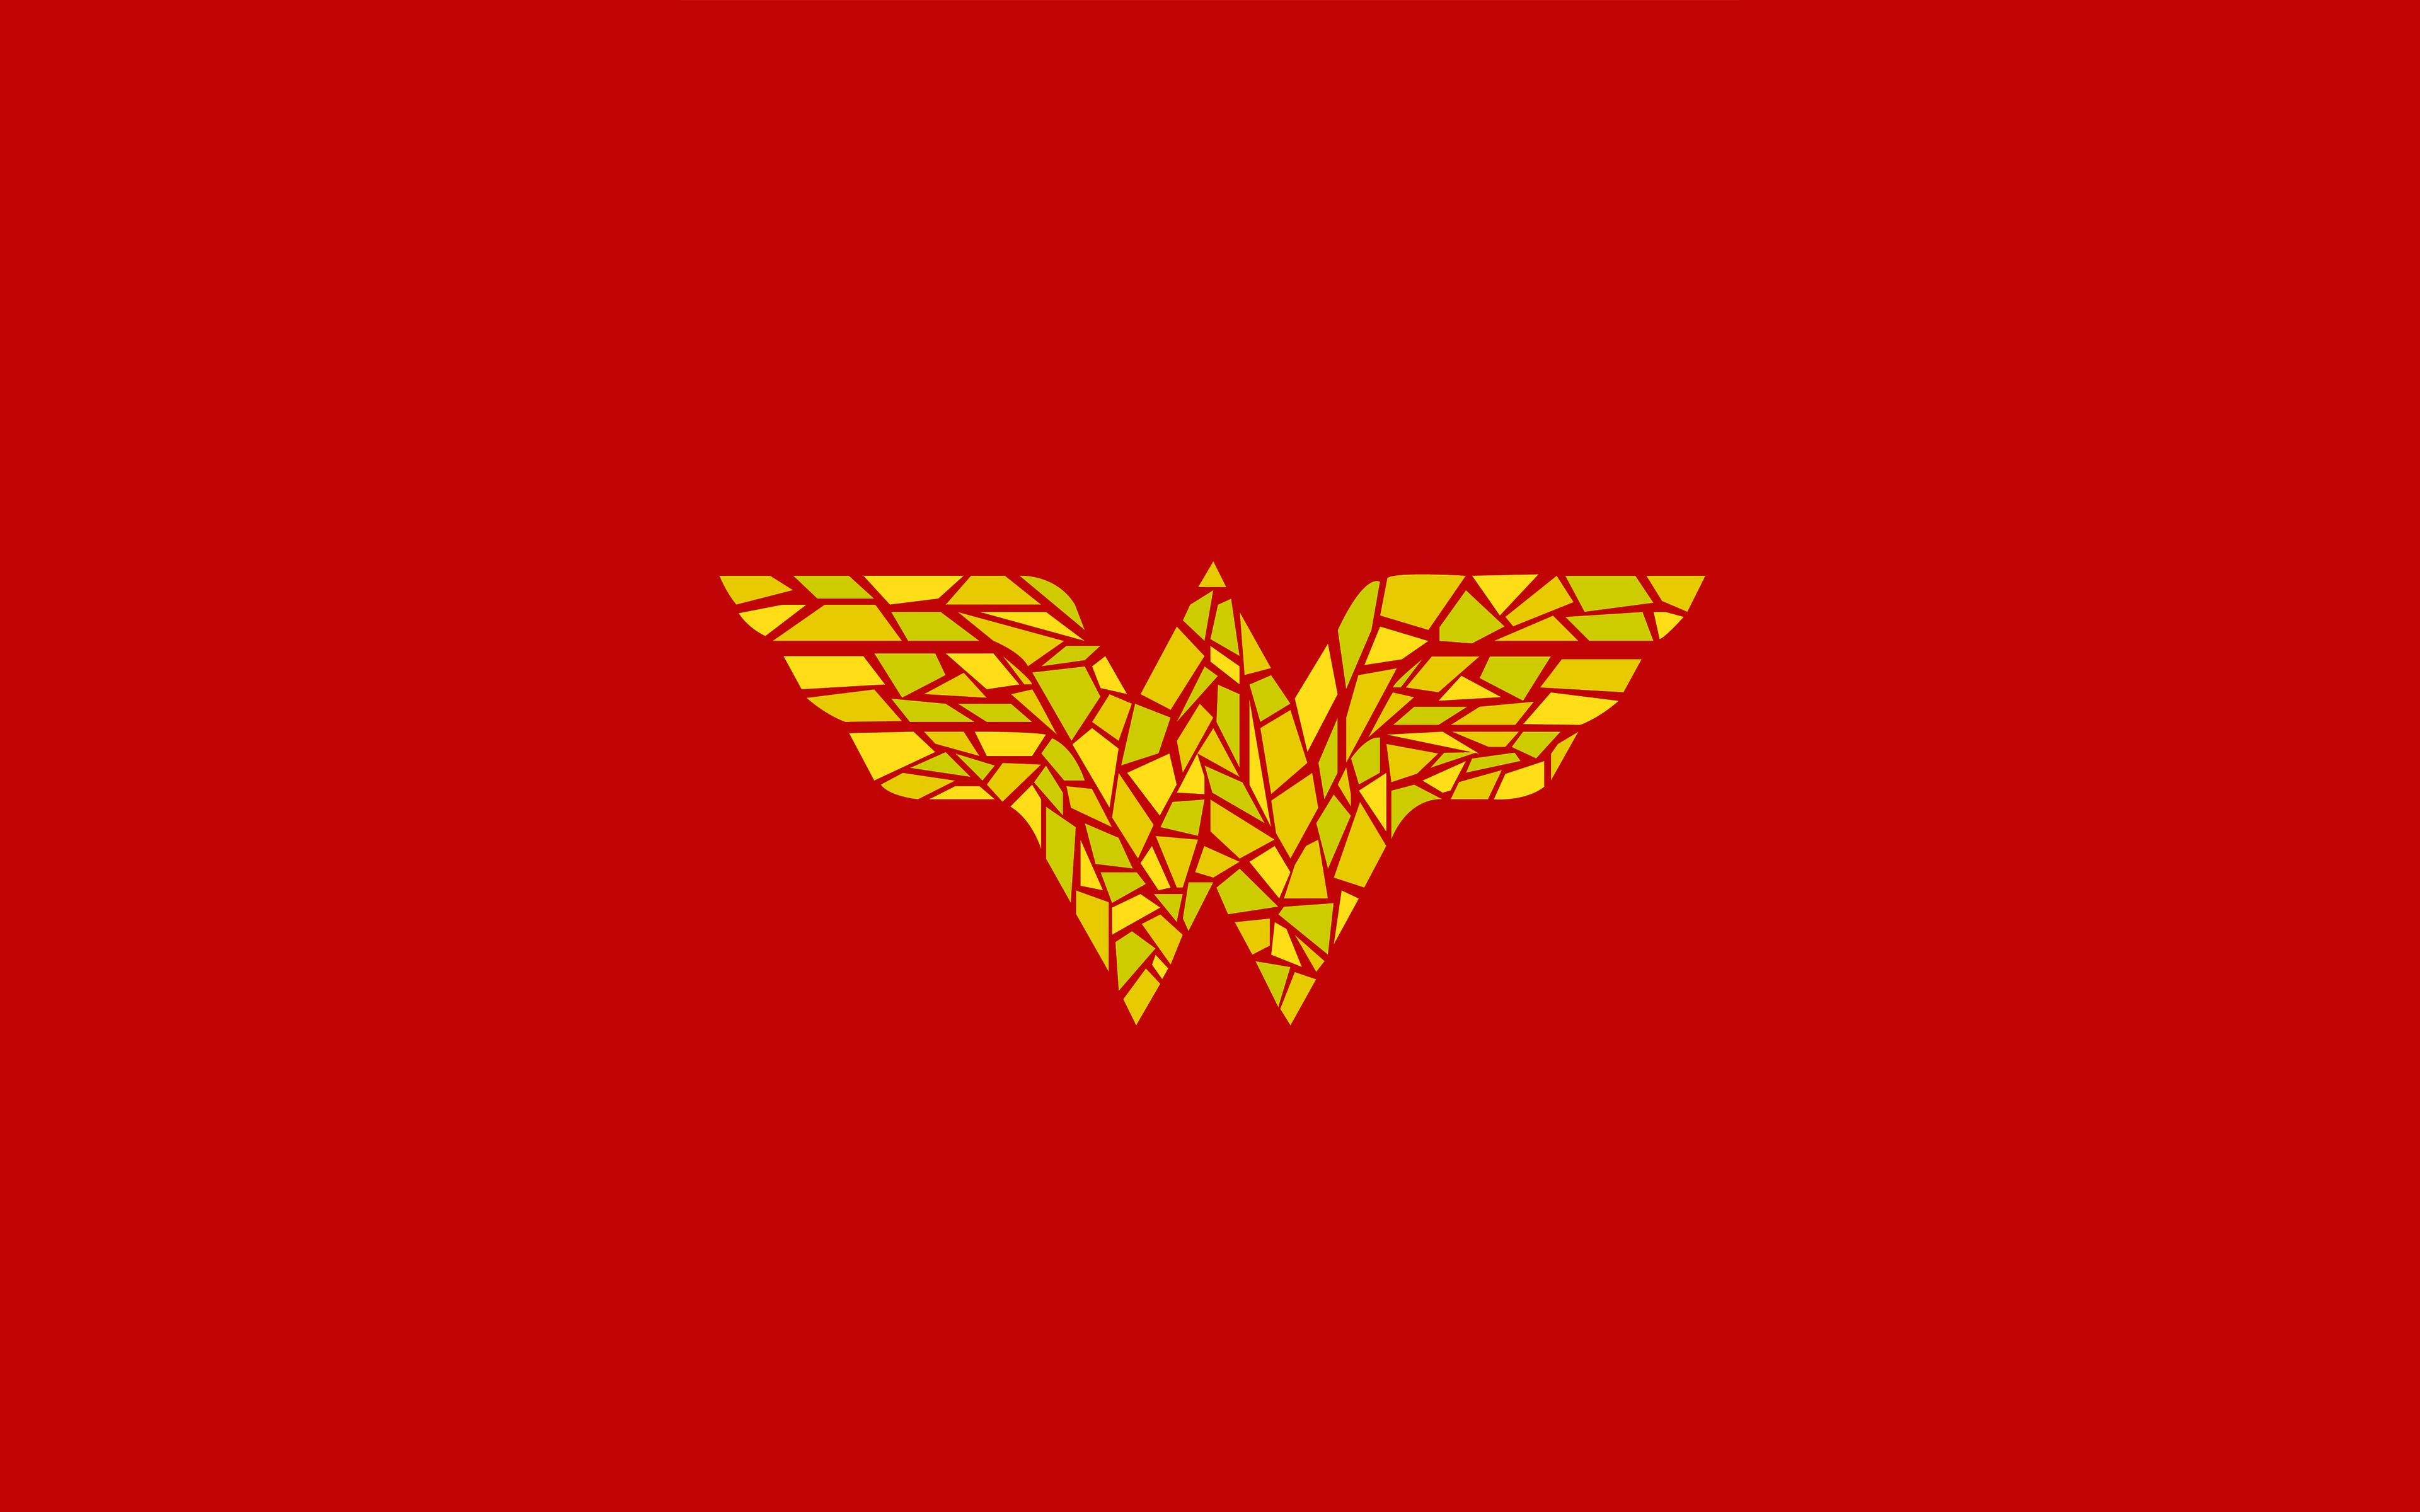 wonder-woman-logo-artwork-0t.jpg